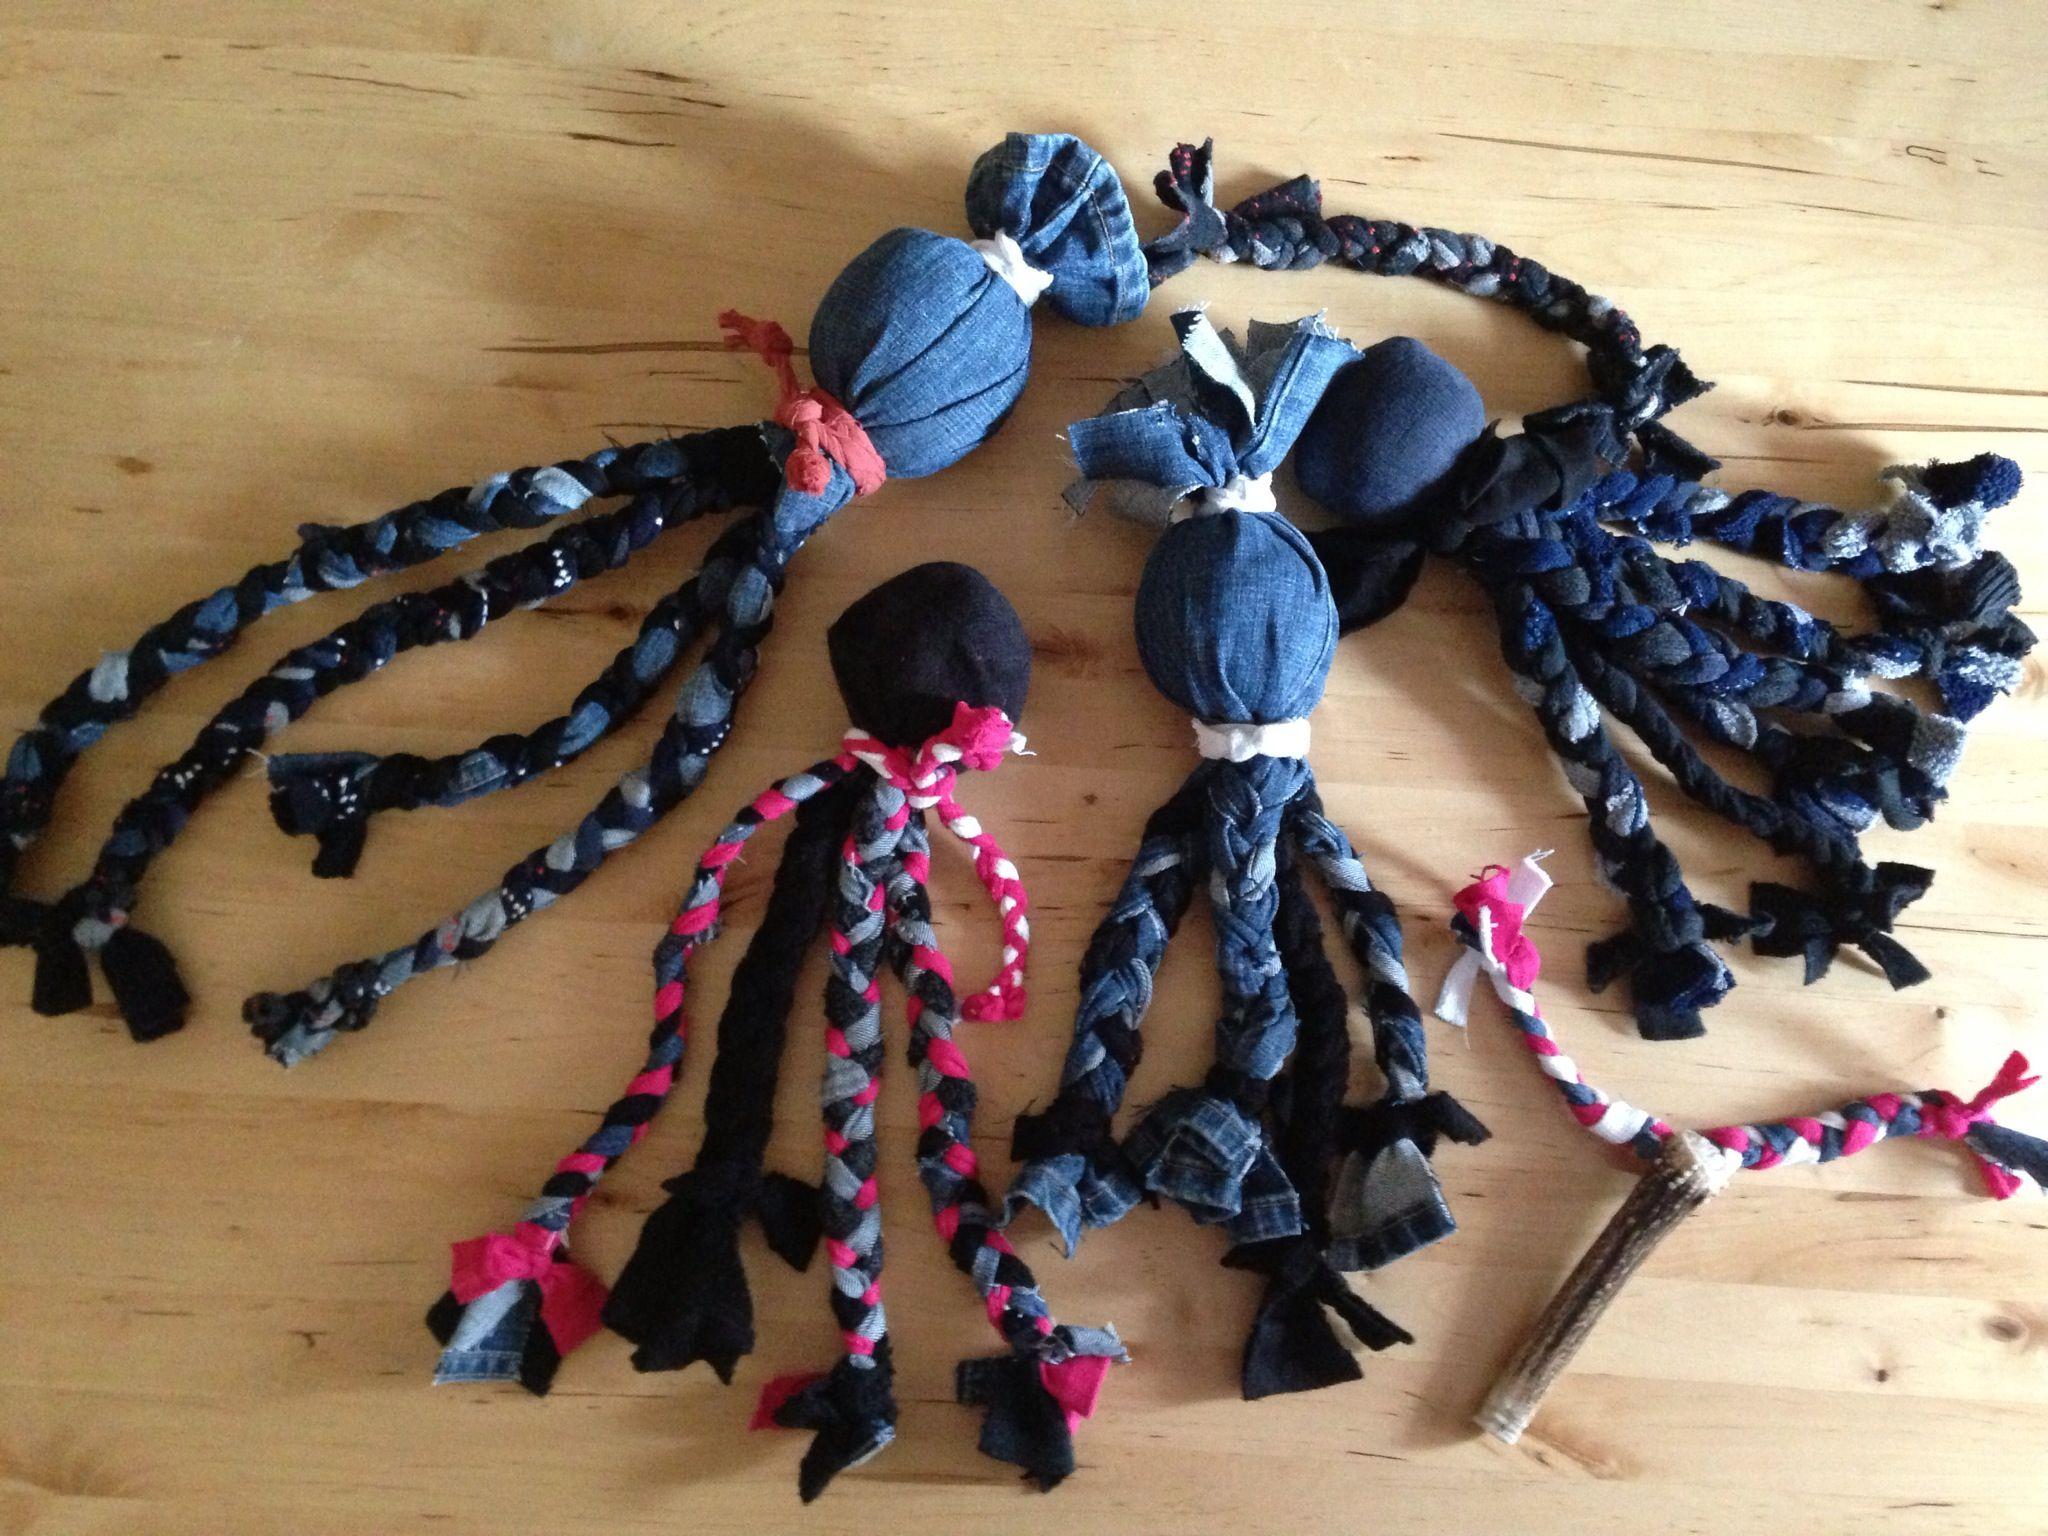 Toys dog socken krake spielzeug handmade